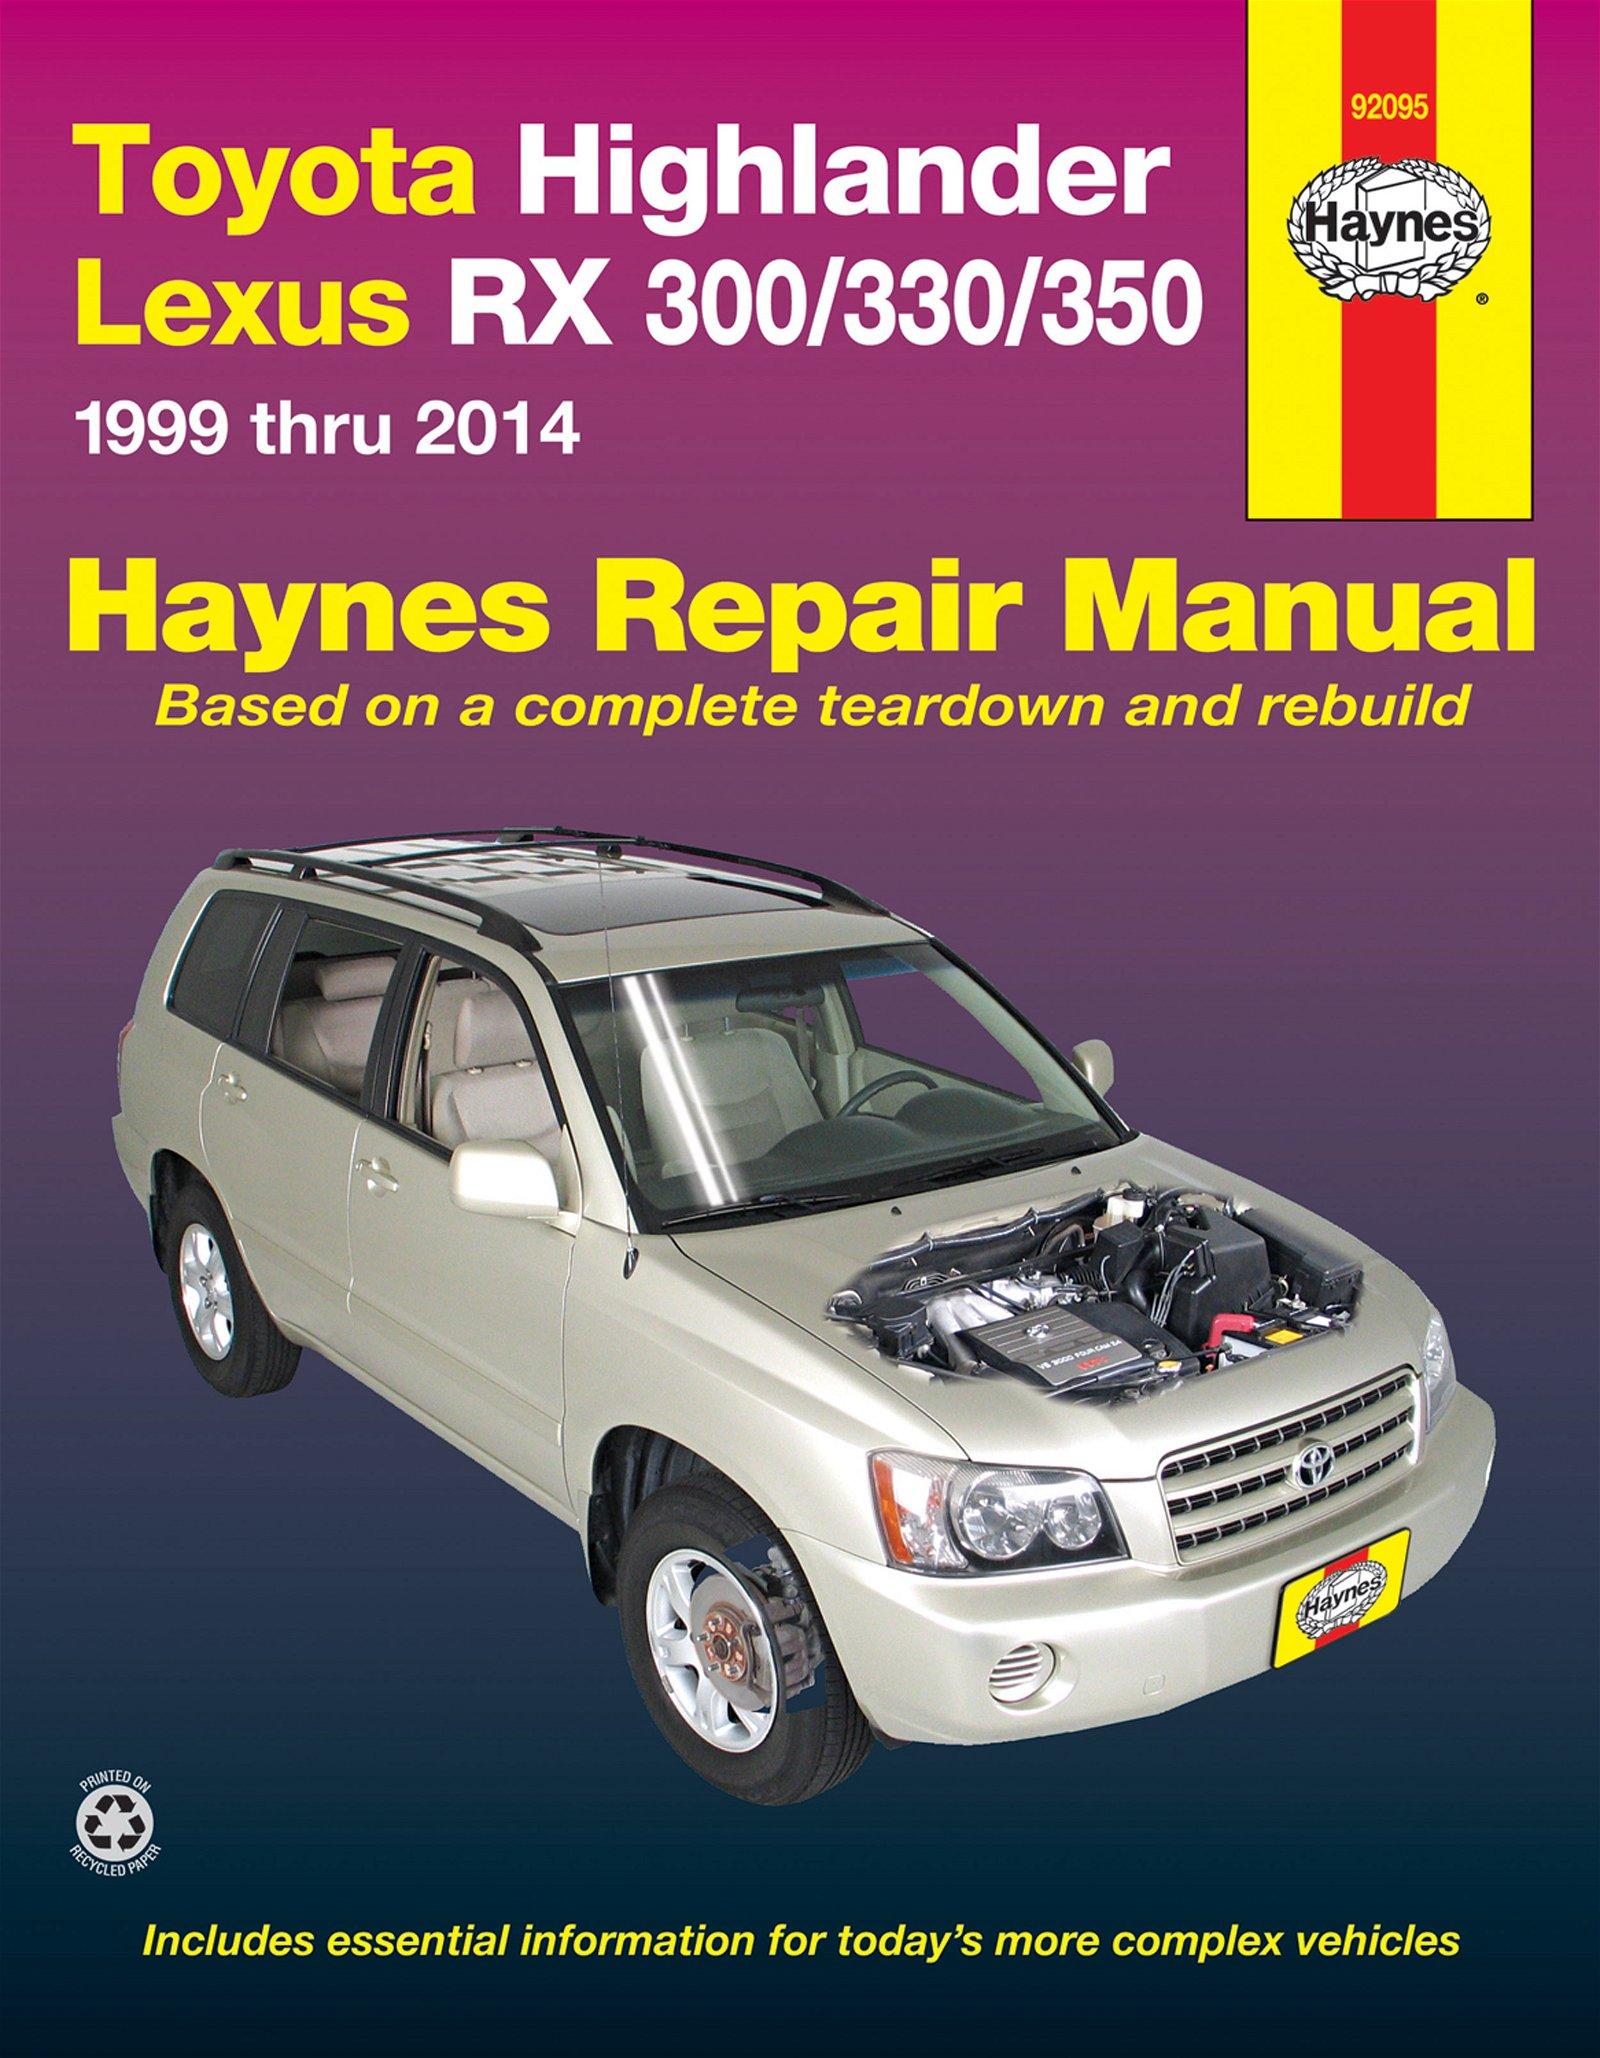 [Manuel US en Anglais] Toyota Highlander  '01 -  '14 & Lexus RX-300/330/350  '99 -  '14